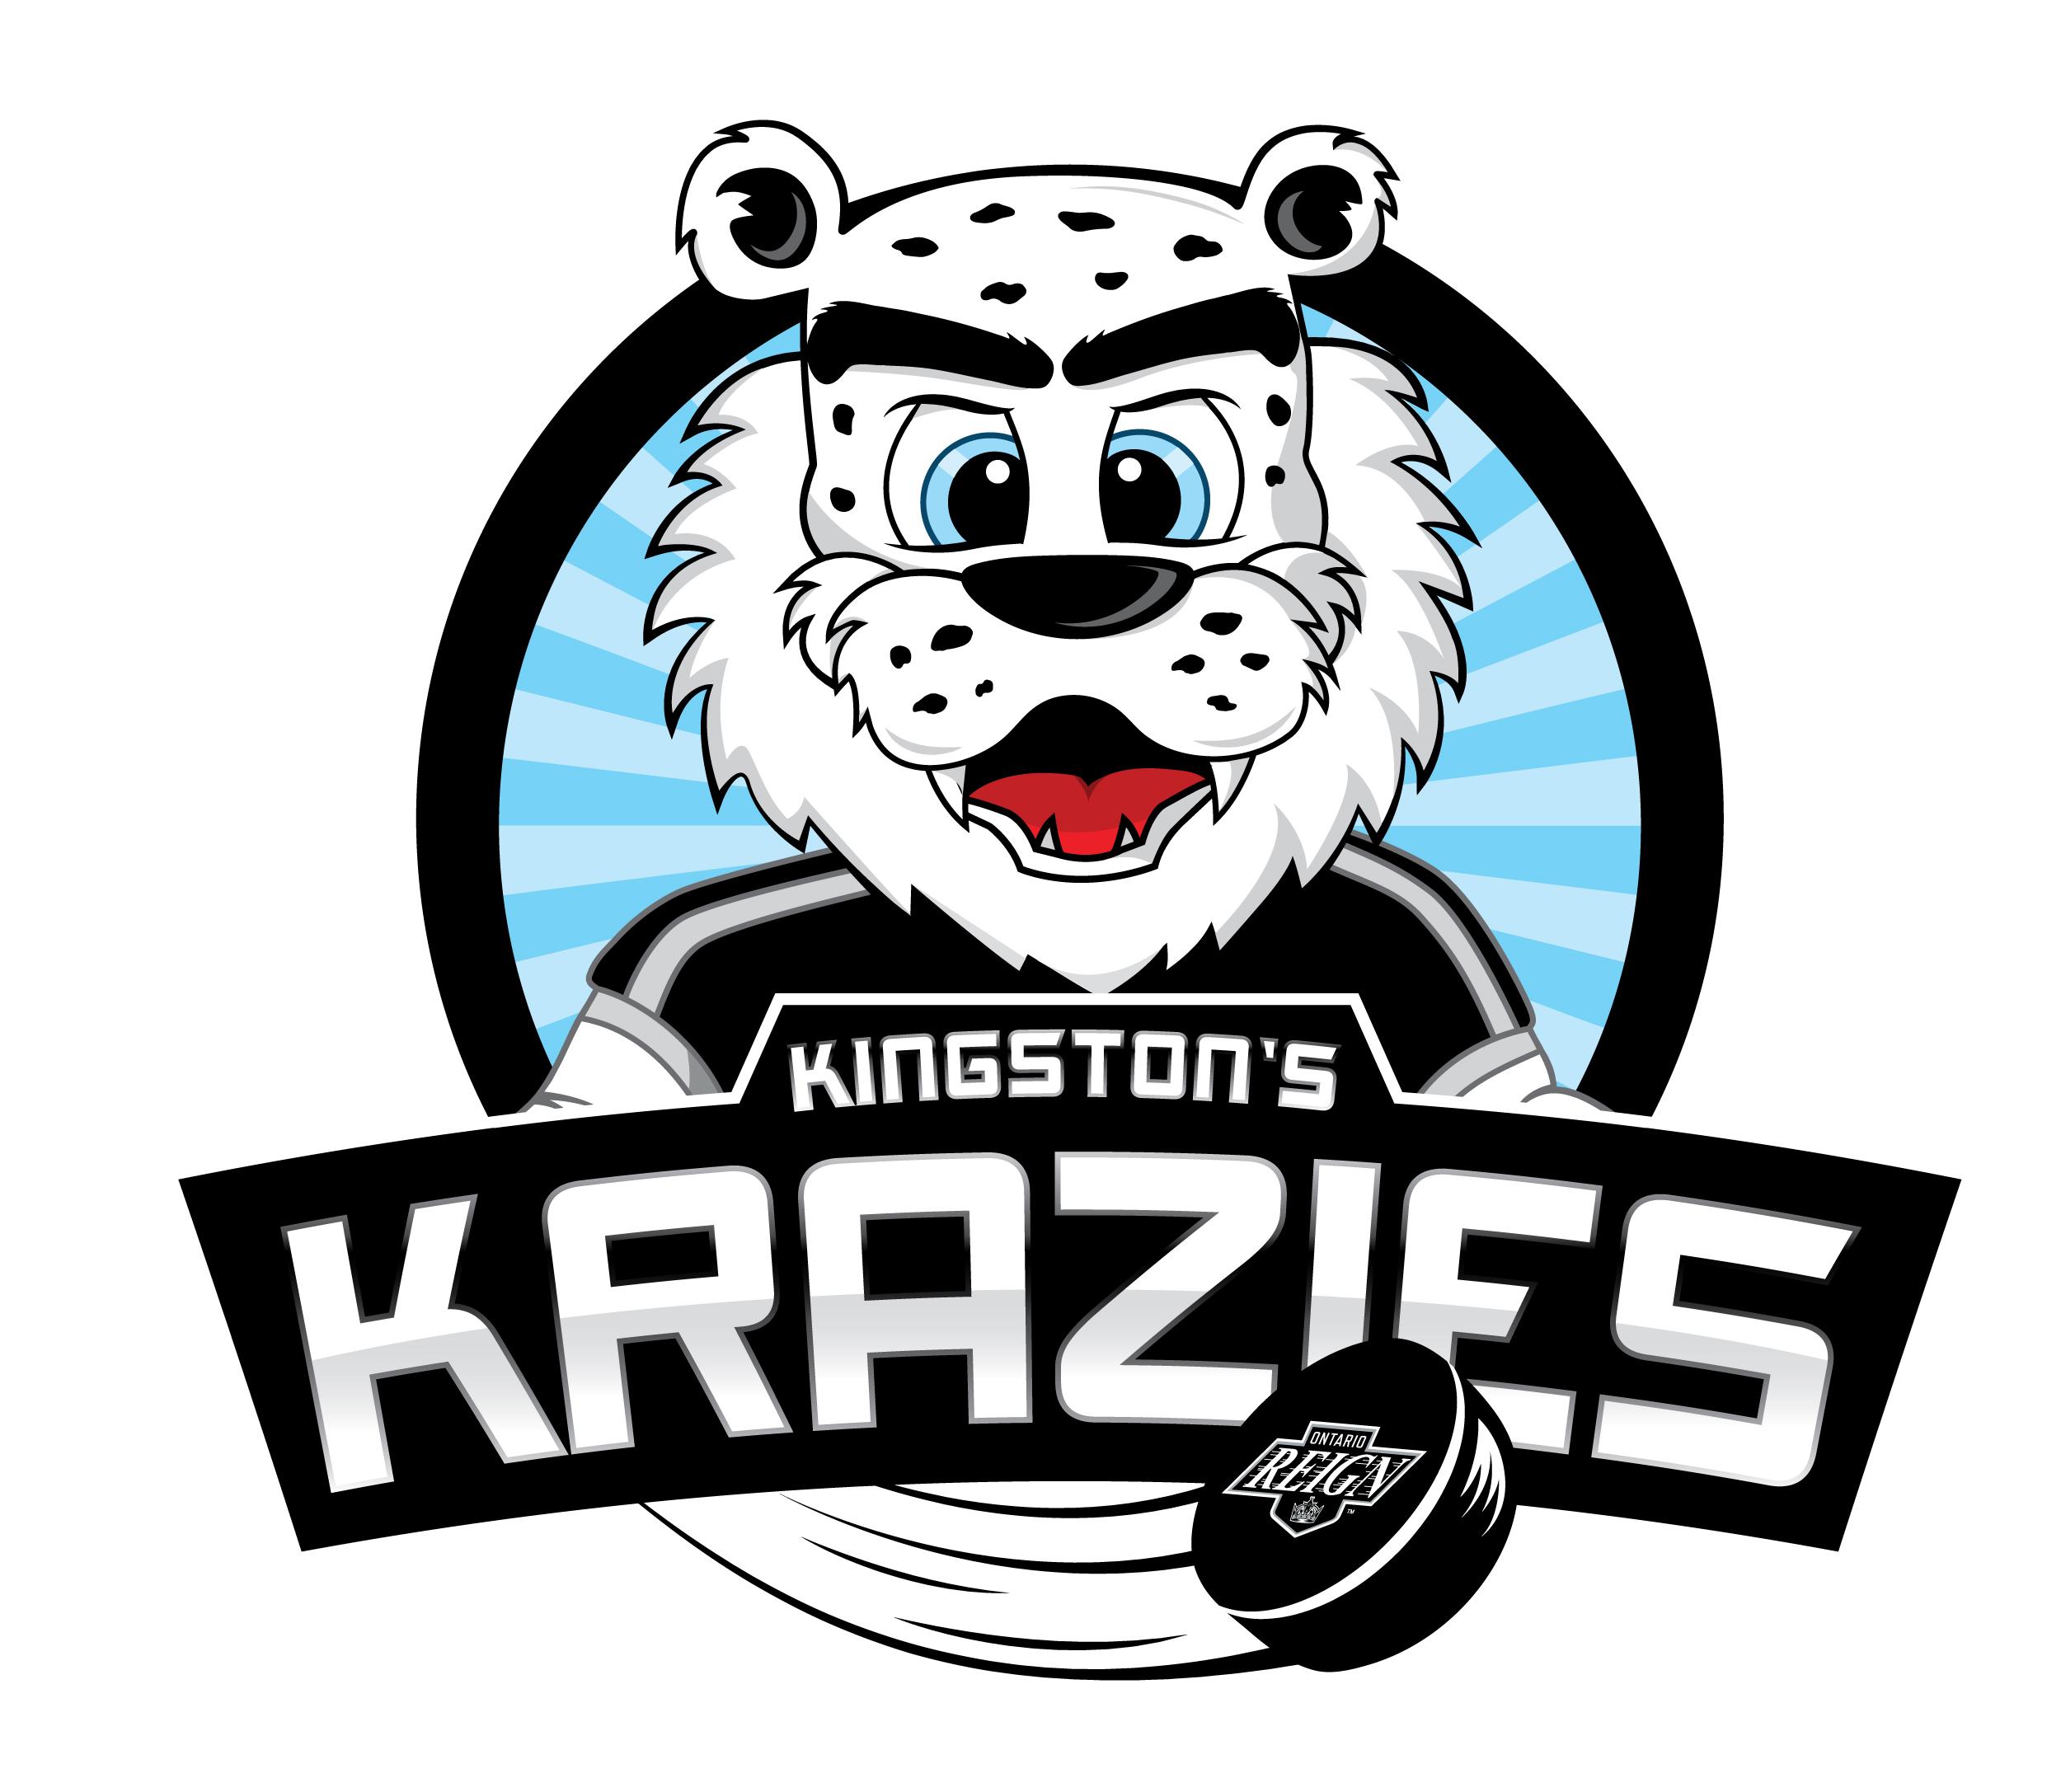 KingstonKrazies_Logo.jpg